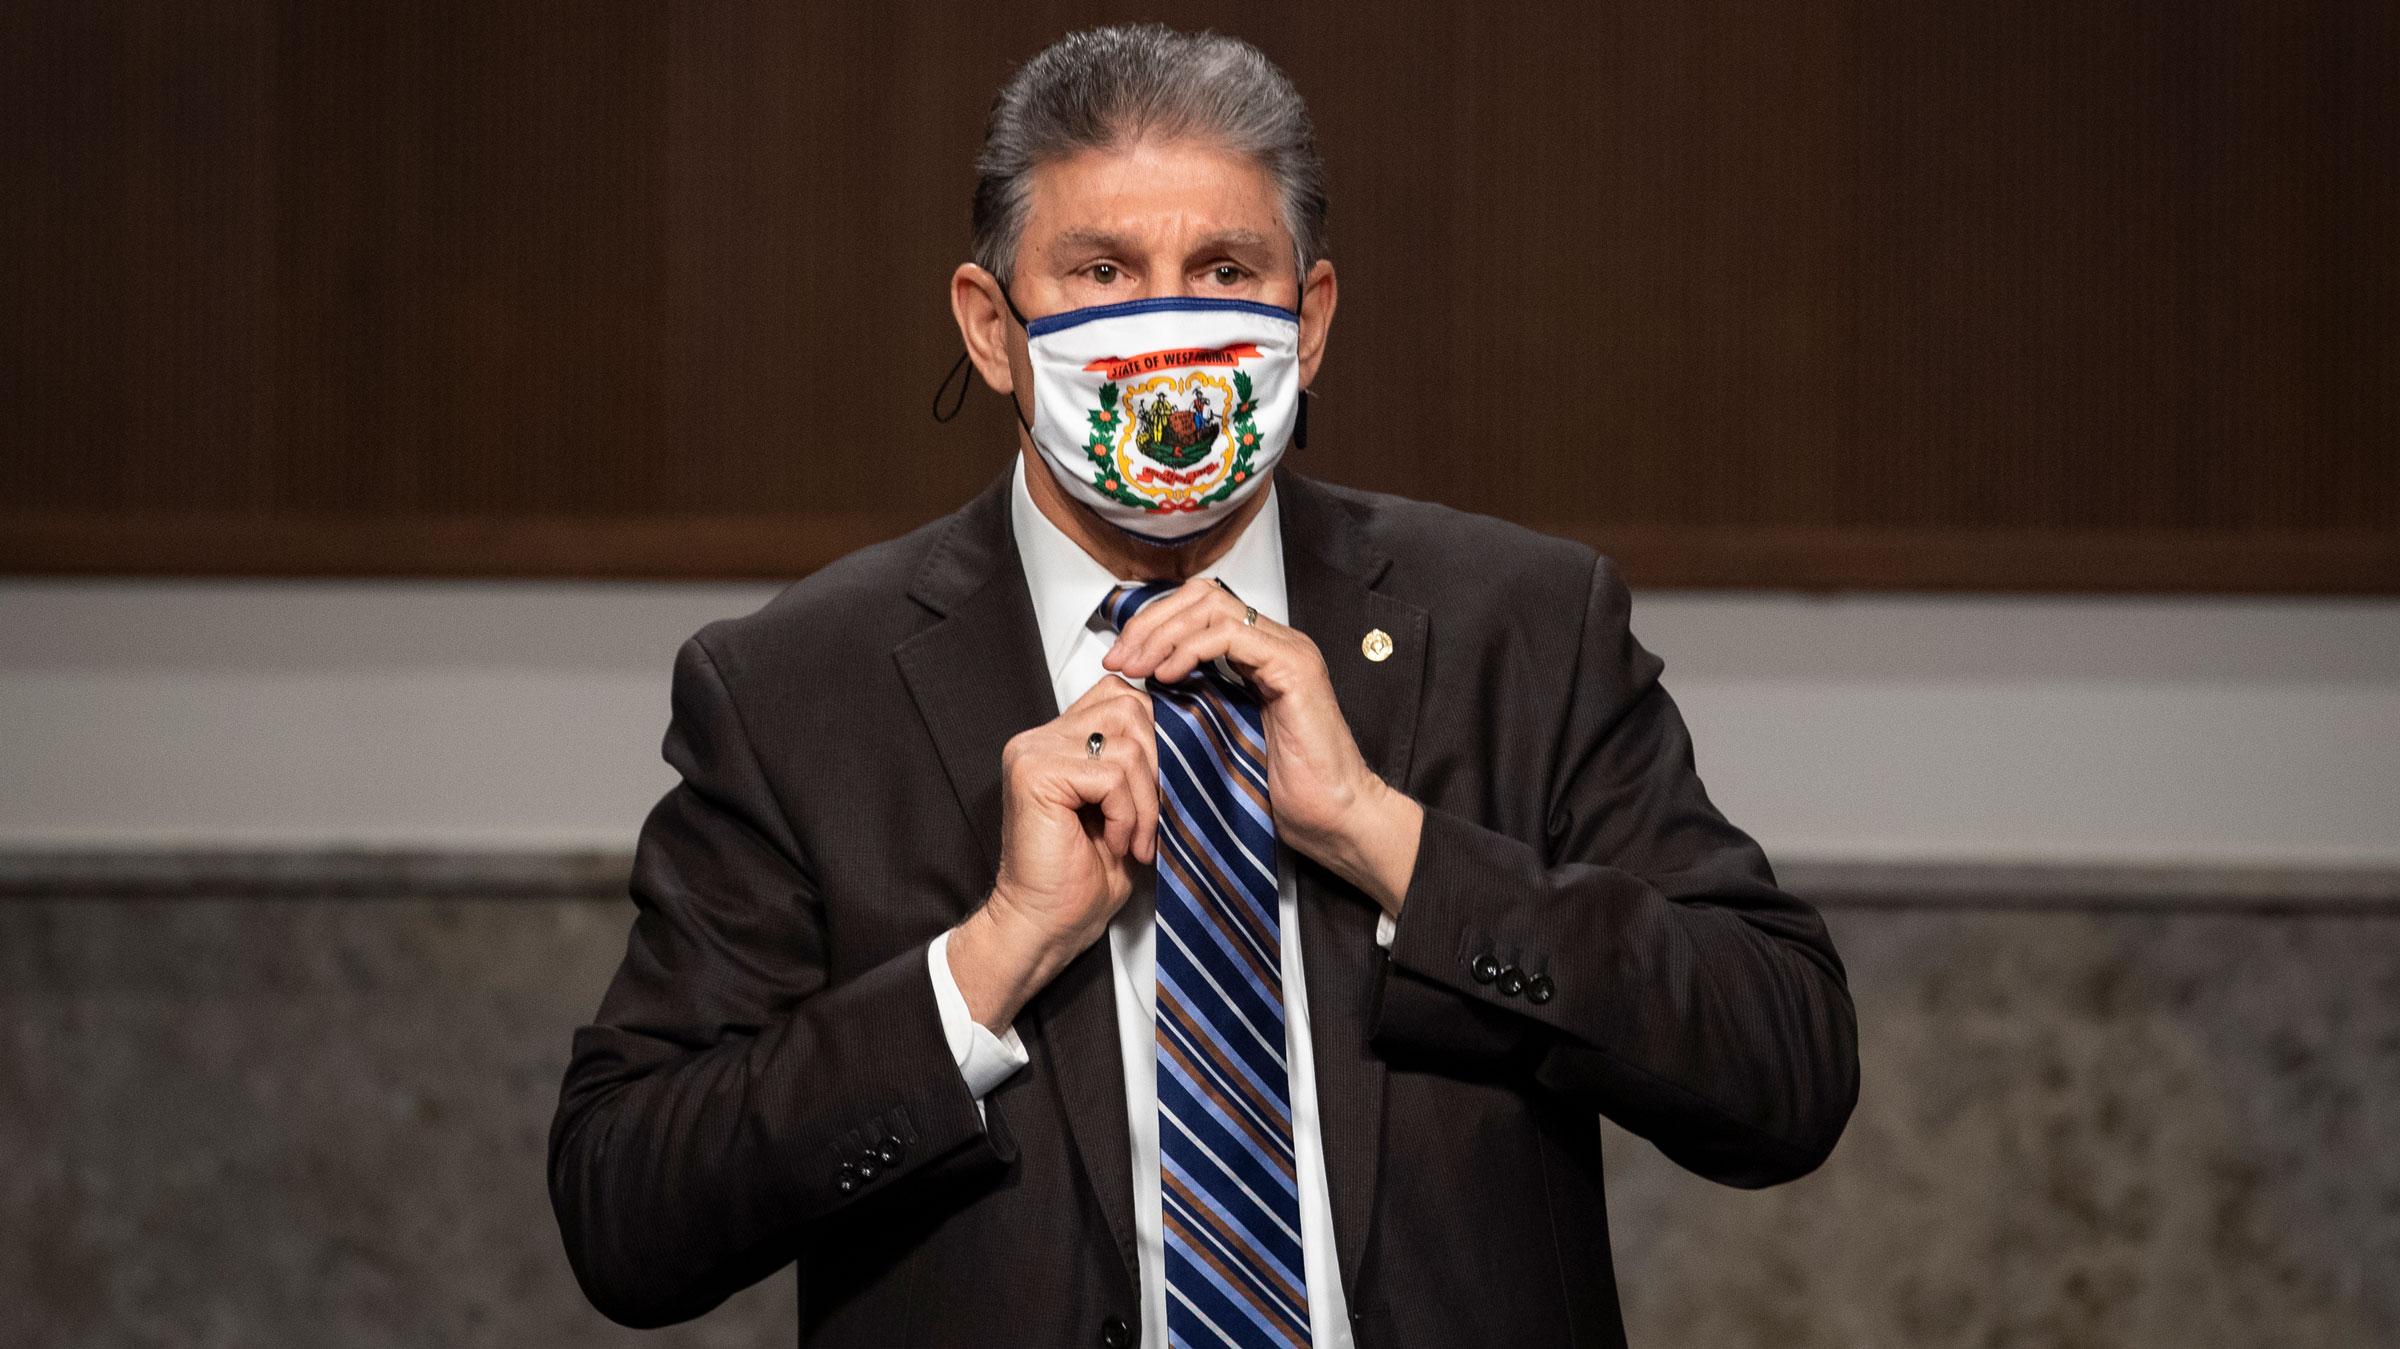 US Sen. Joe Manchin adjusts his tie during a meeting on Thursday.